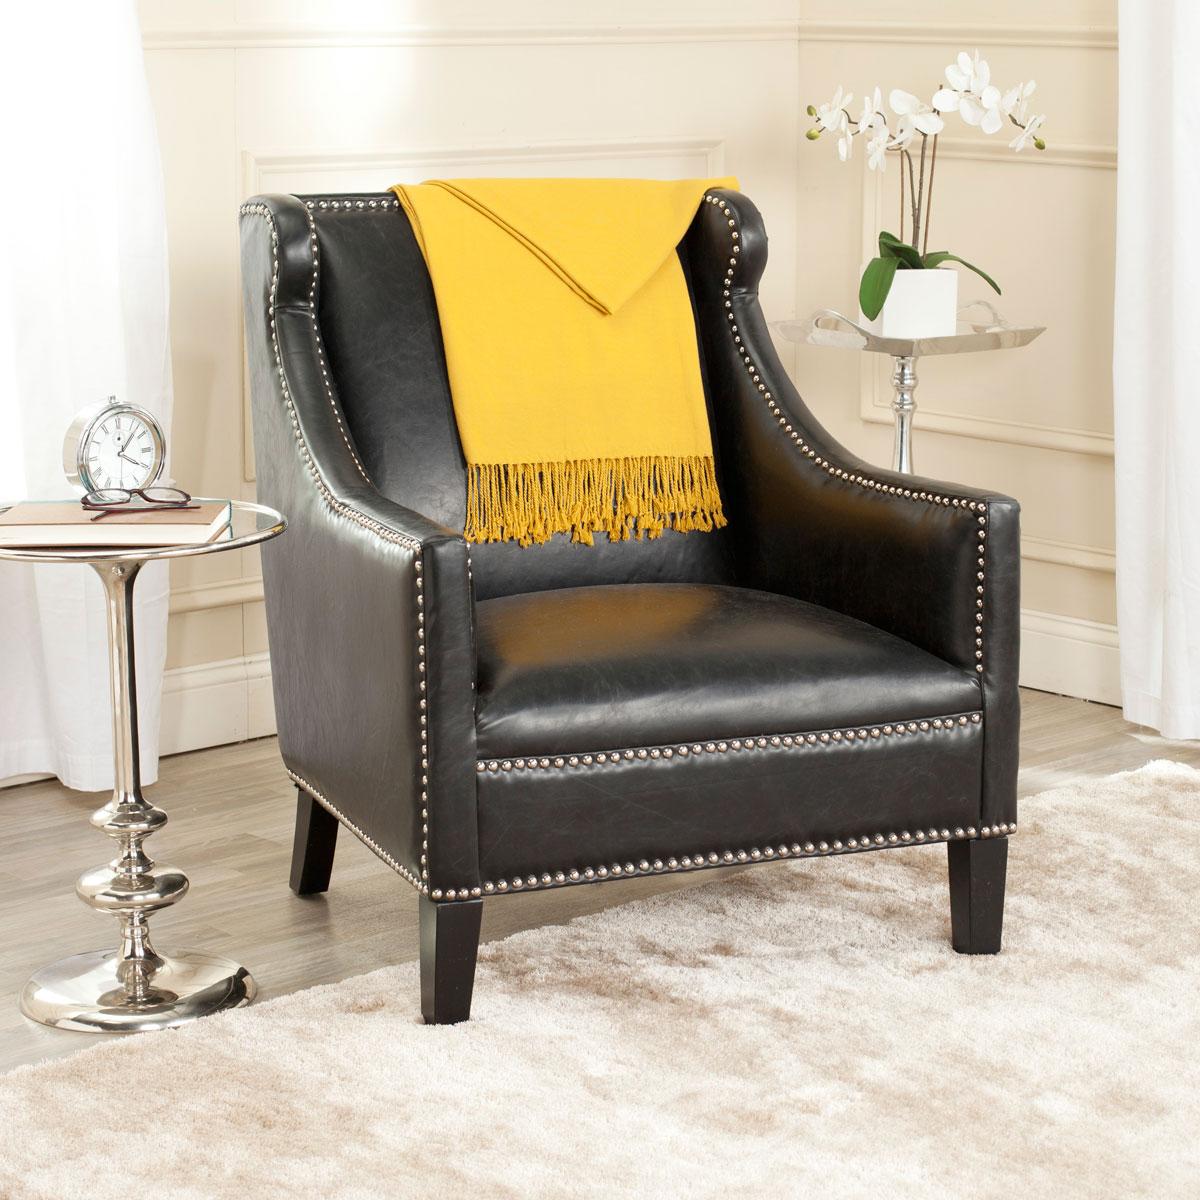 Astonishing Mcr4735A Accent Chairs Furniture By Safavieh Inzonedesignstudio Interior Chair Design Inzonedesignstudiocom